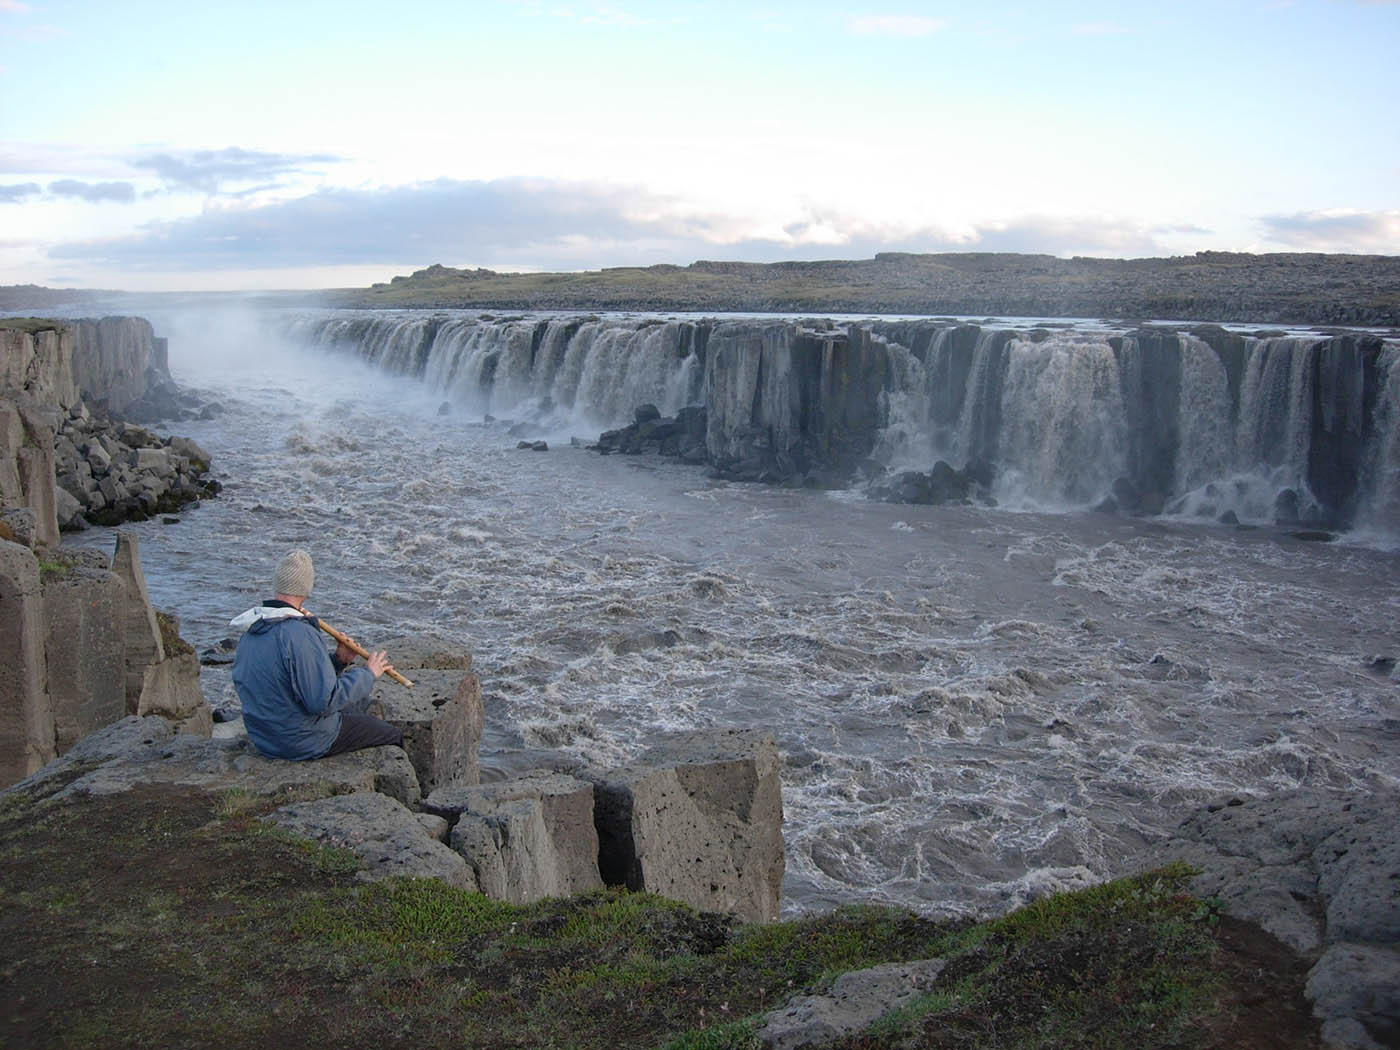 Iceland 2008 Bansuri Kerry Kriger - Flute at Selfoss 1400